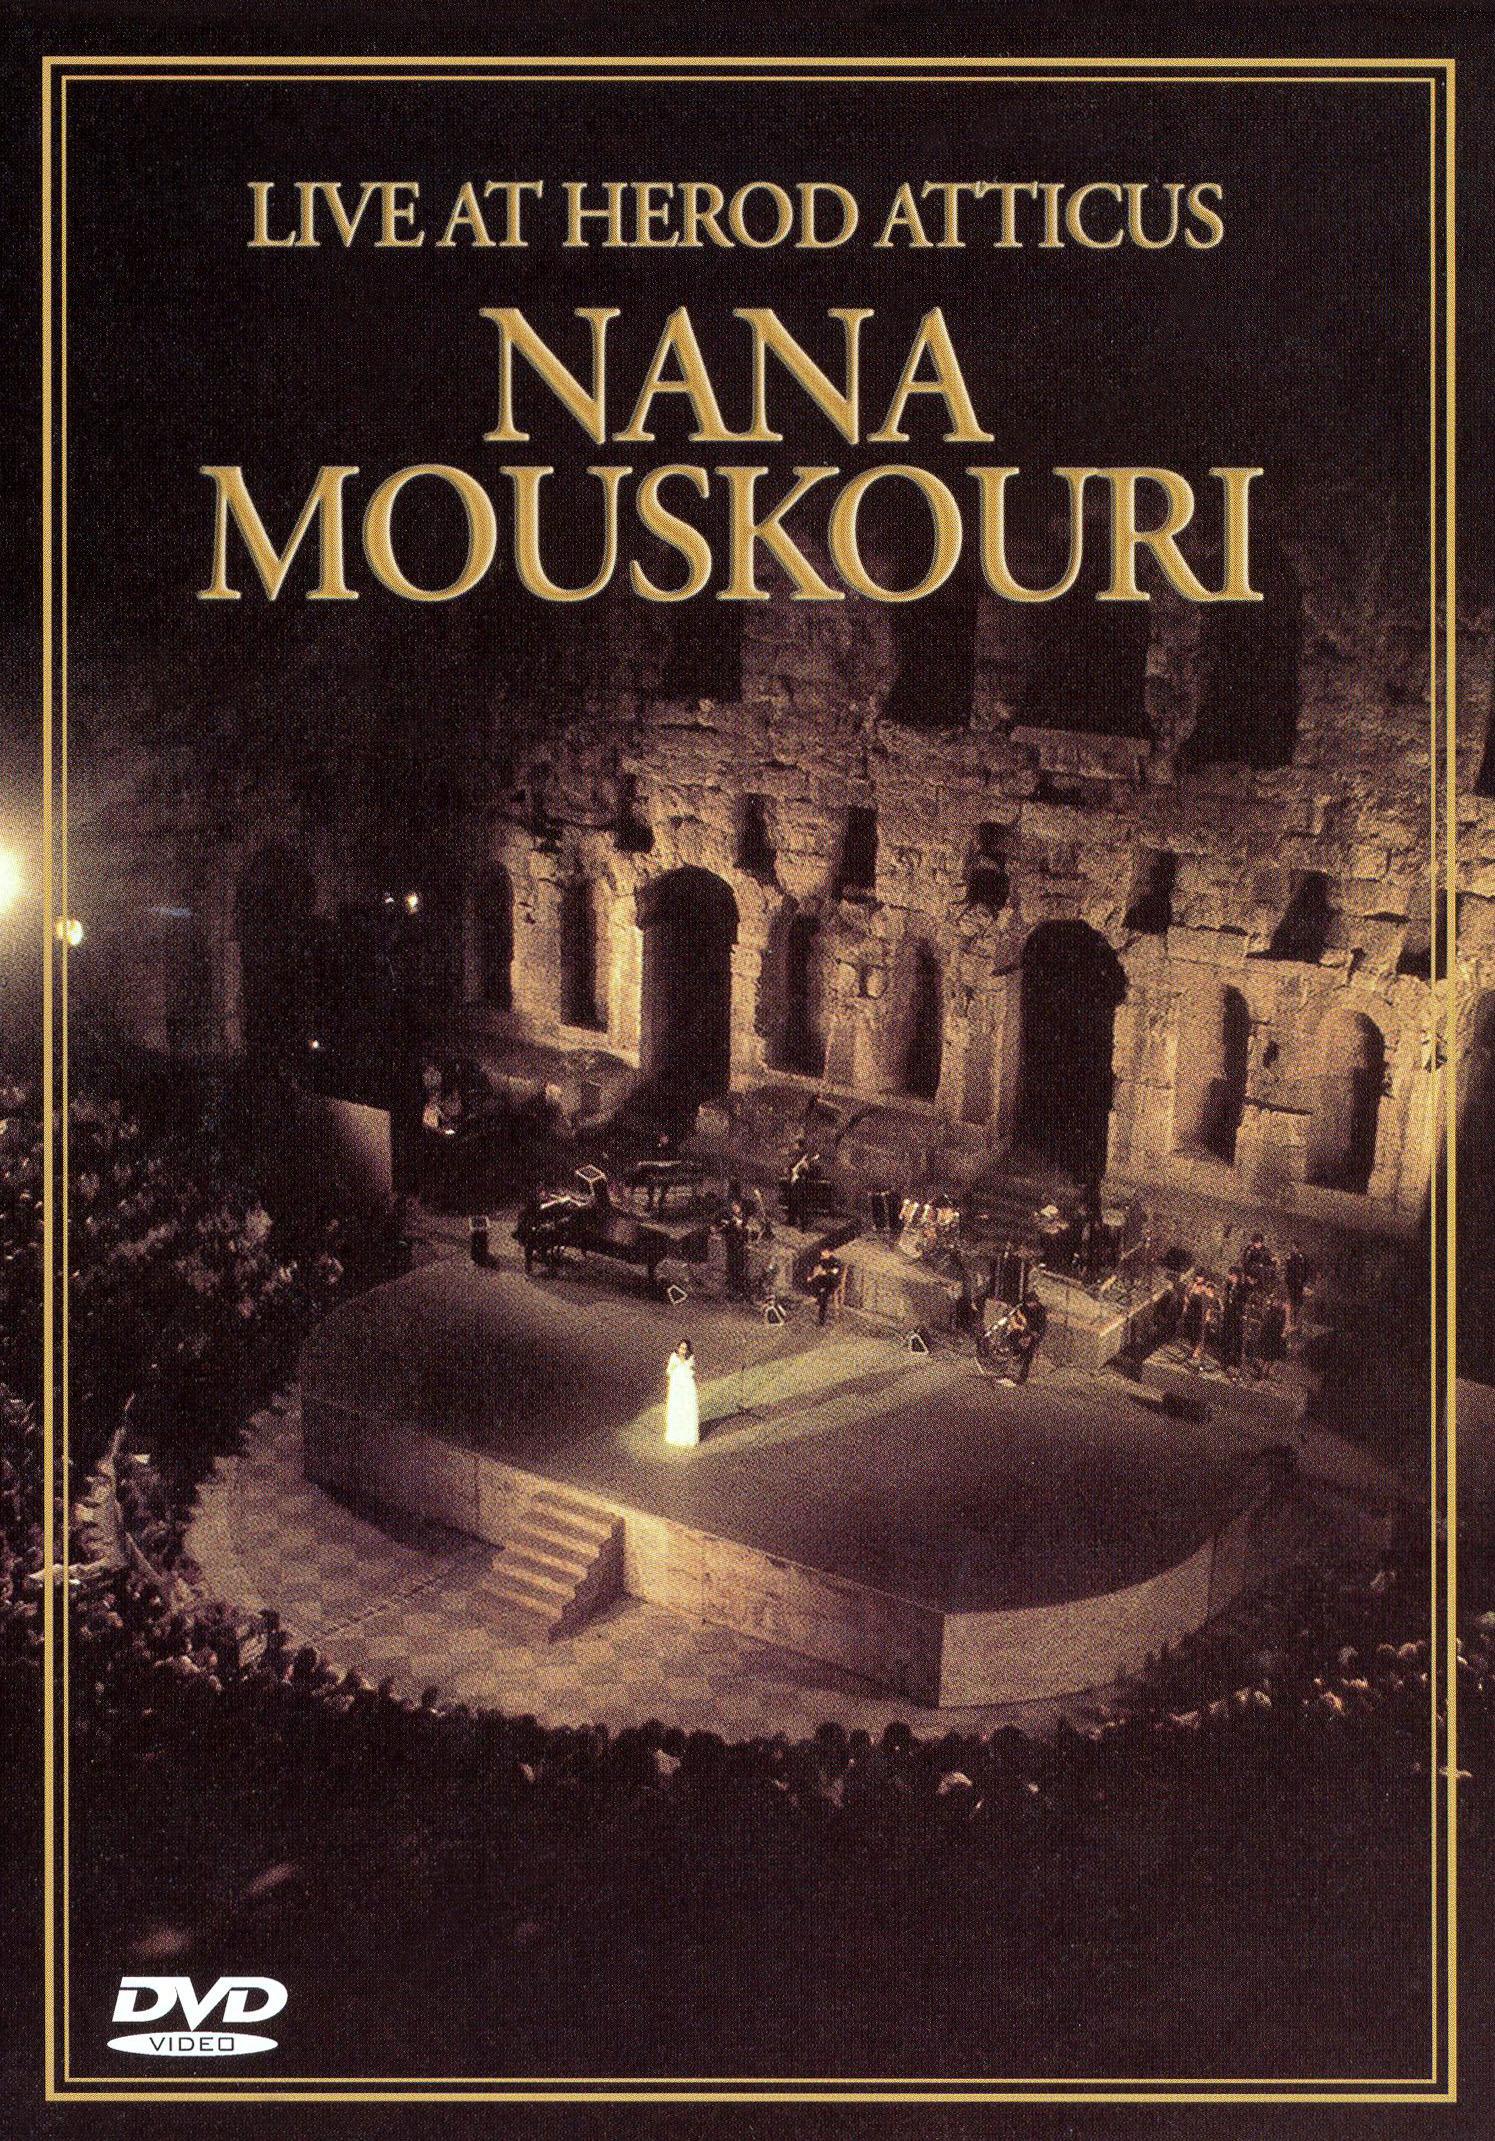 Nana Mouskouri: Live at Herod Atticus